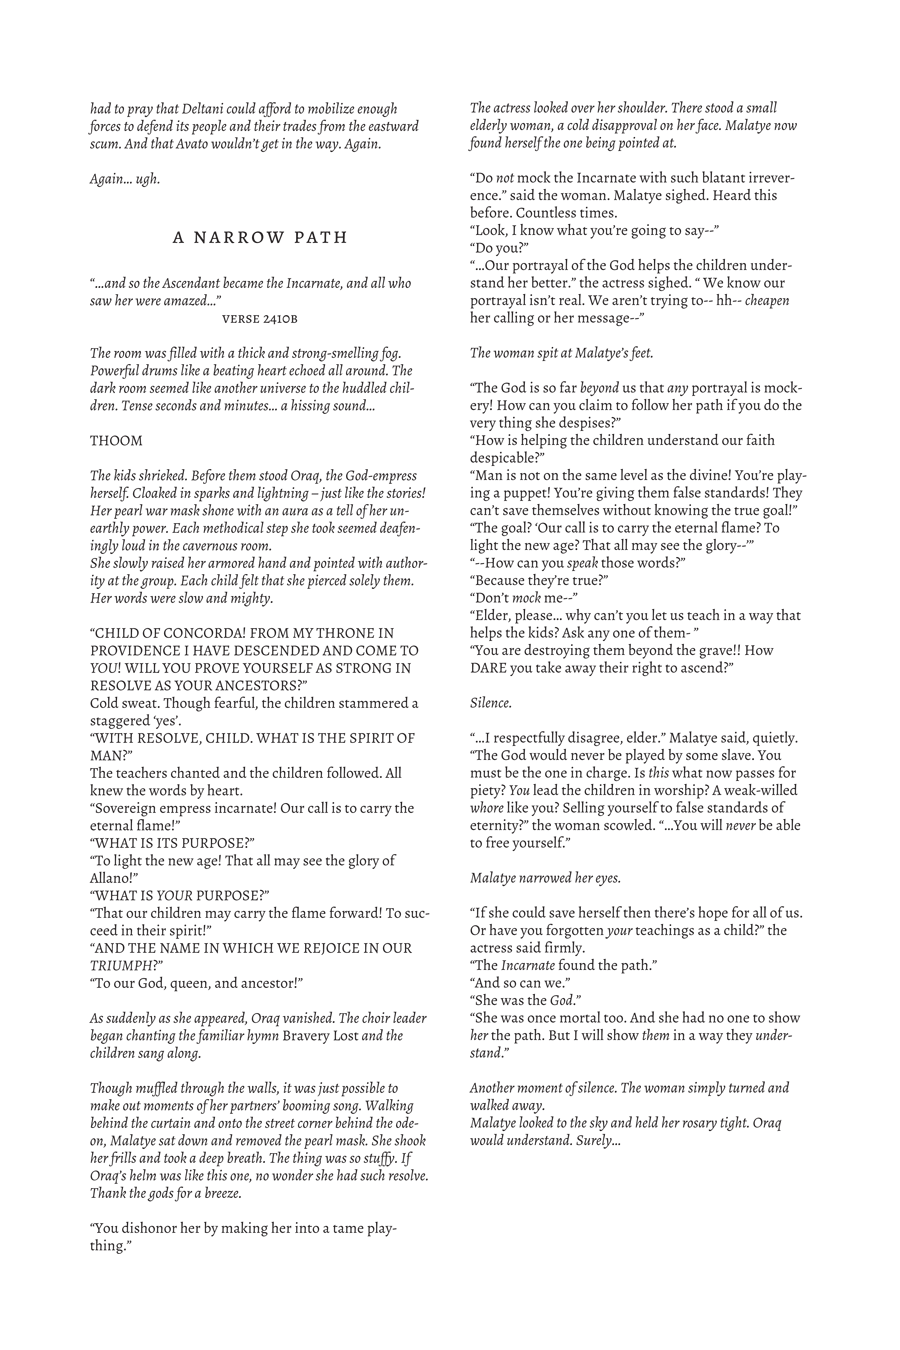 pg 128